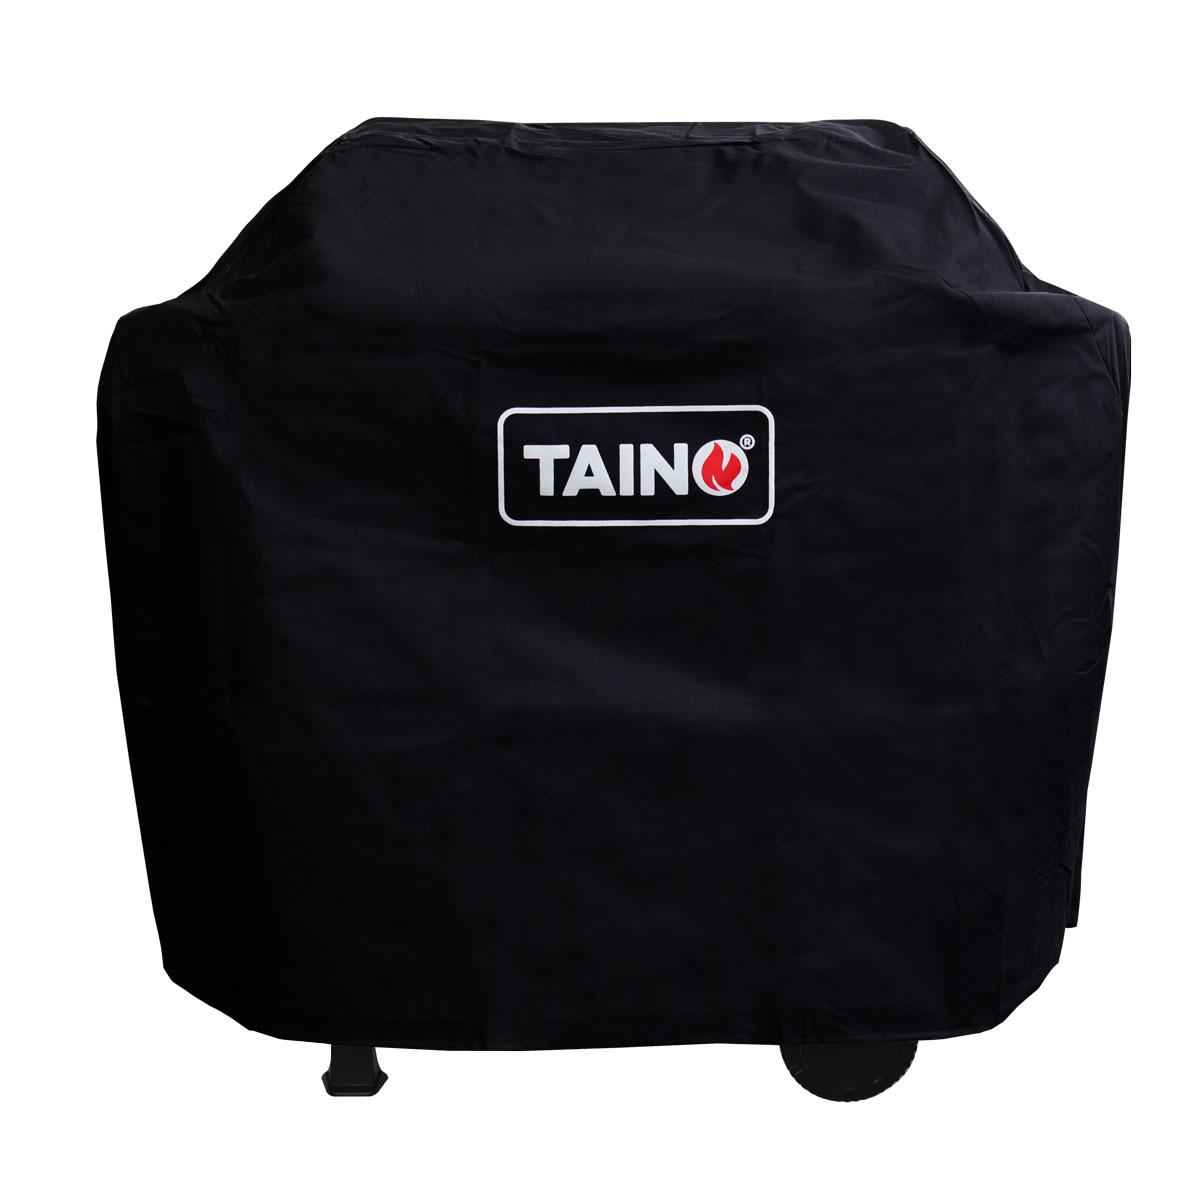 98882 TAINO BASIC Abdeckung Gasgrill Abdeckhaube